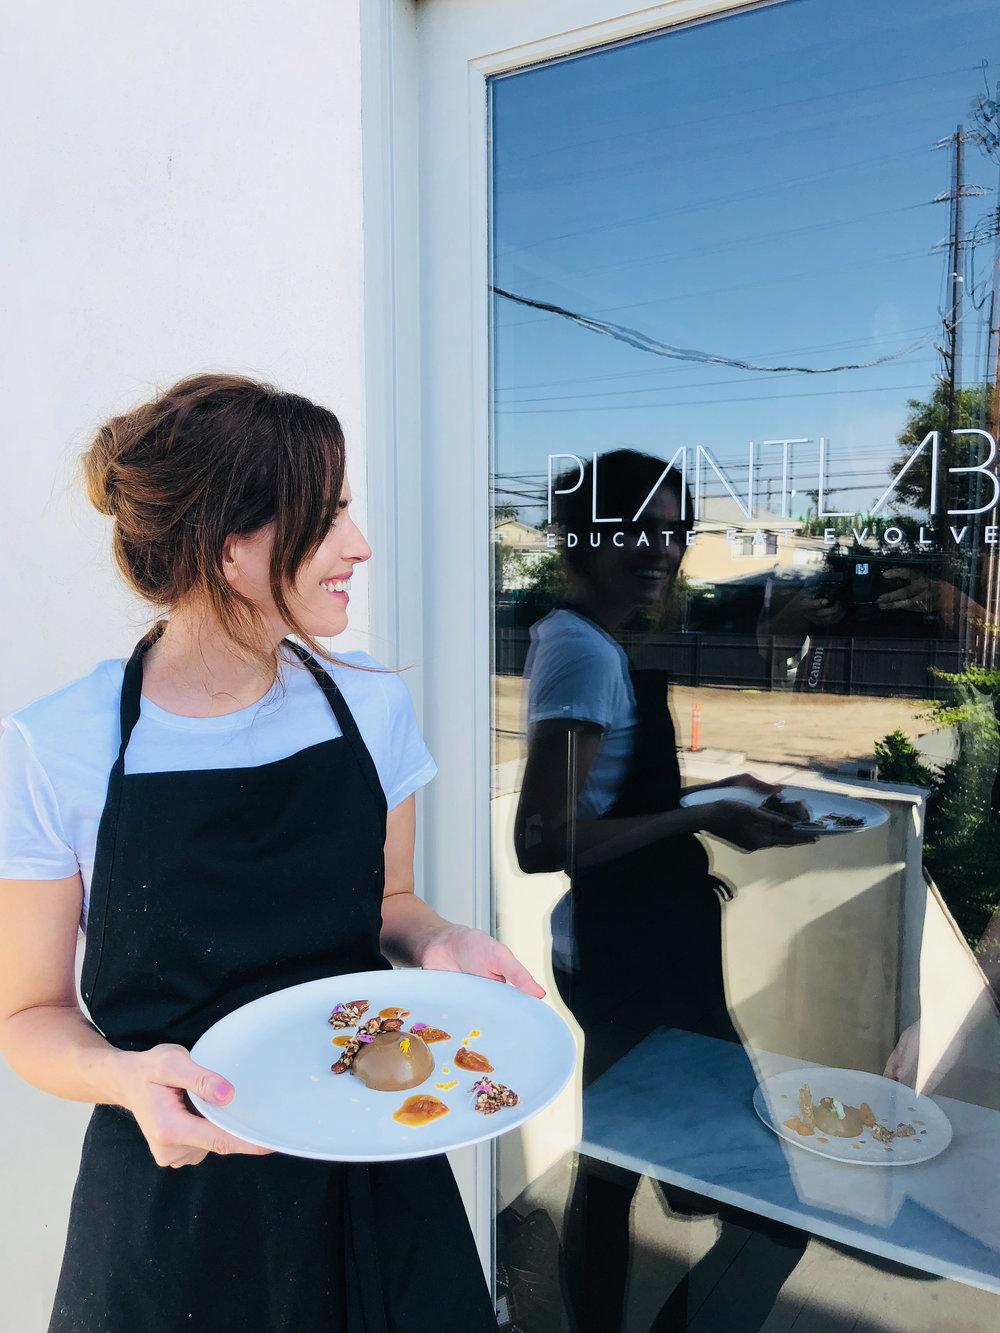 Plantlab, Holly White, Vegan Chef, LA, Venice, Plantlab